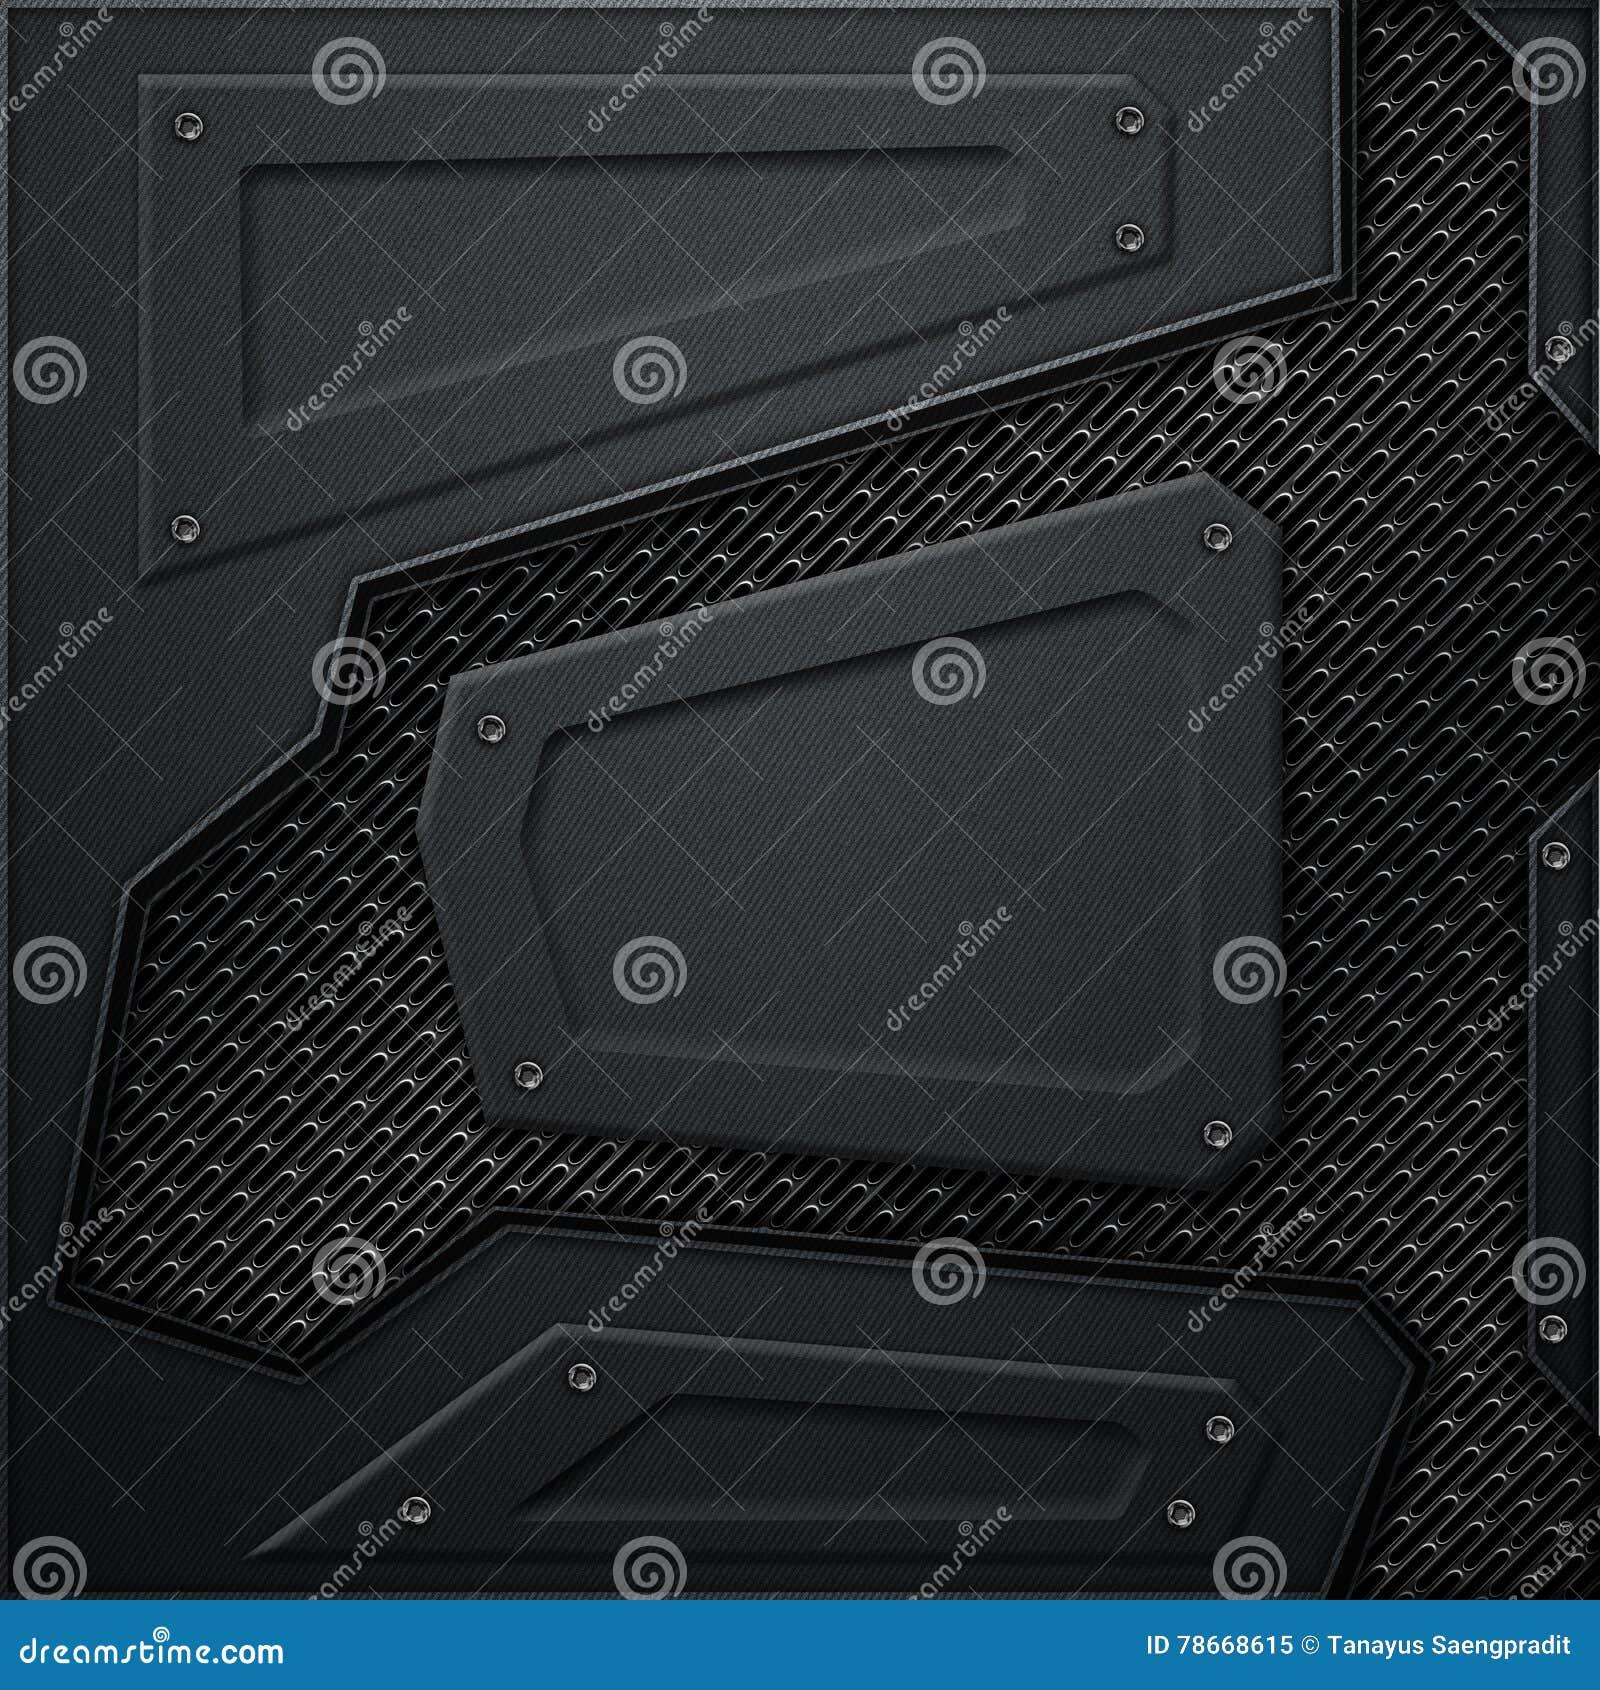 Scifi Wall Black Carbon Fiber Wall Black Mesh Metal Backgr Background Texture D Illustration Technology Concept on Carbon Fiber Texture